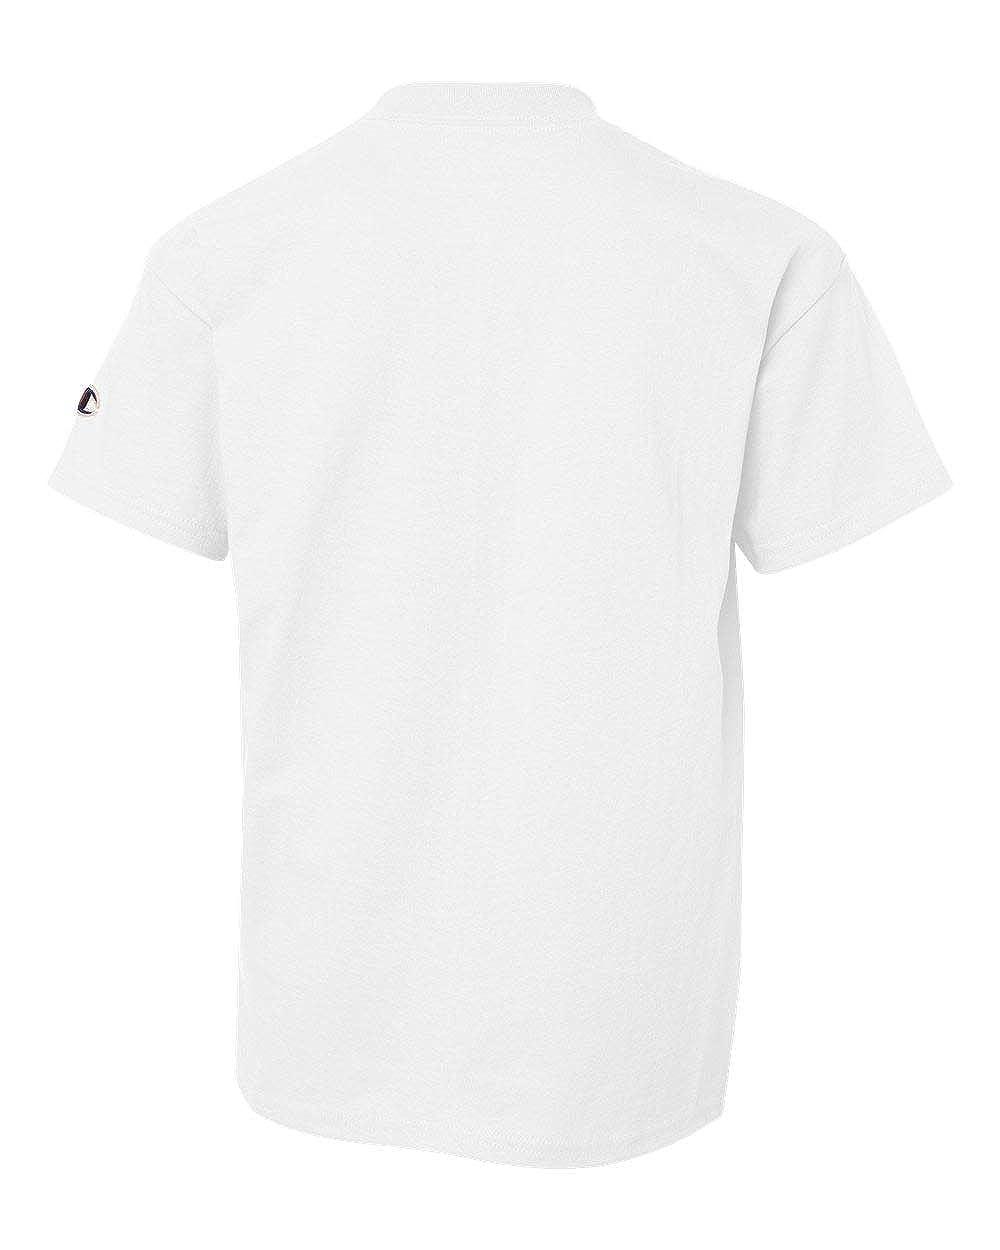 S White Tagless T-Shirt Champion Youth 6.1 Oz